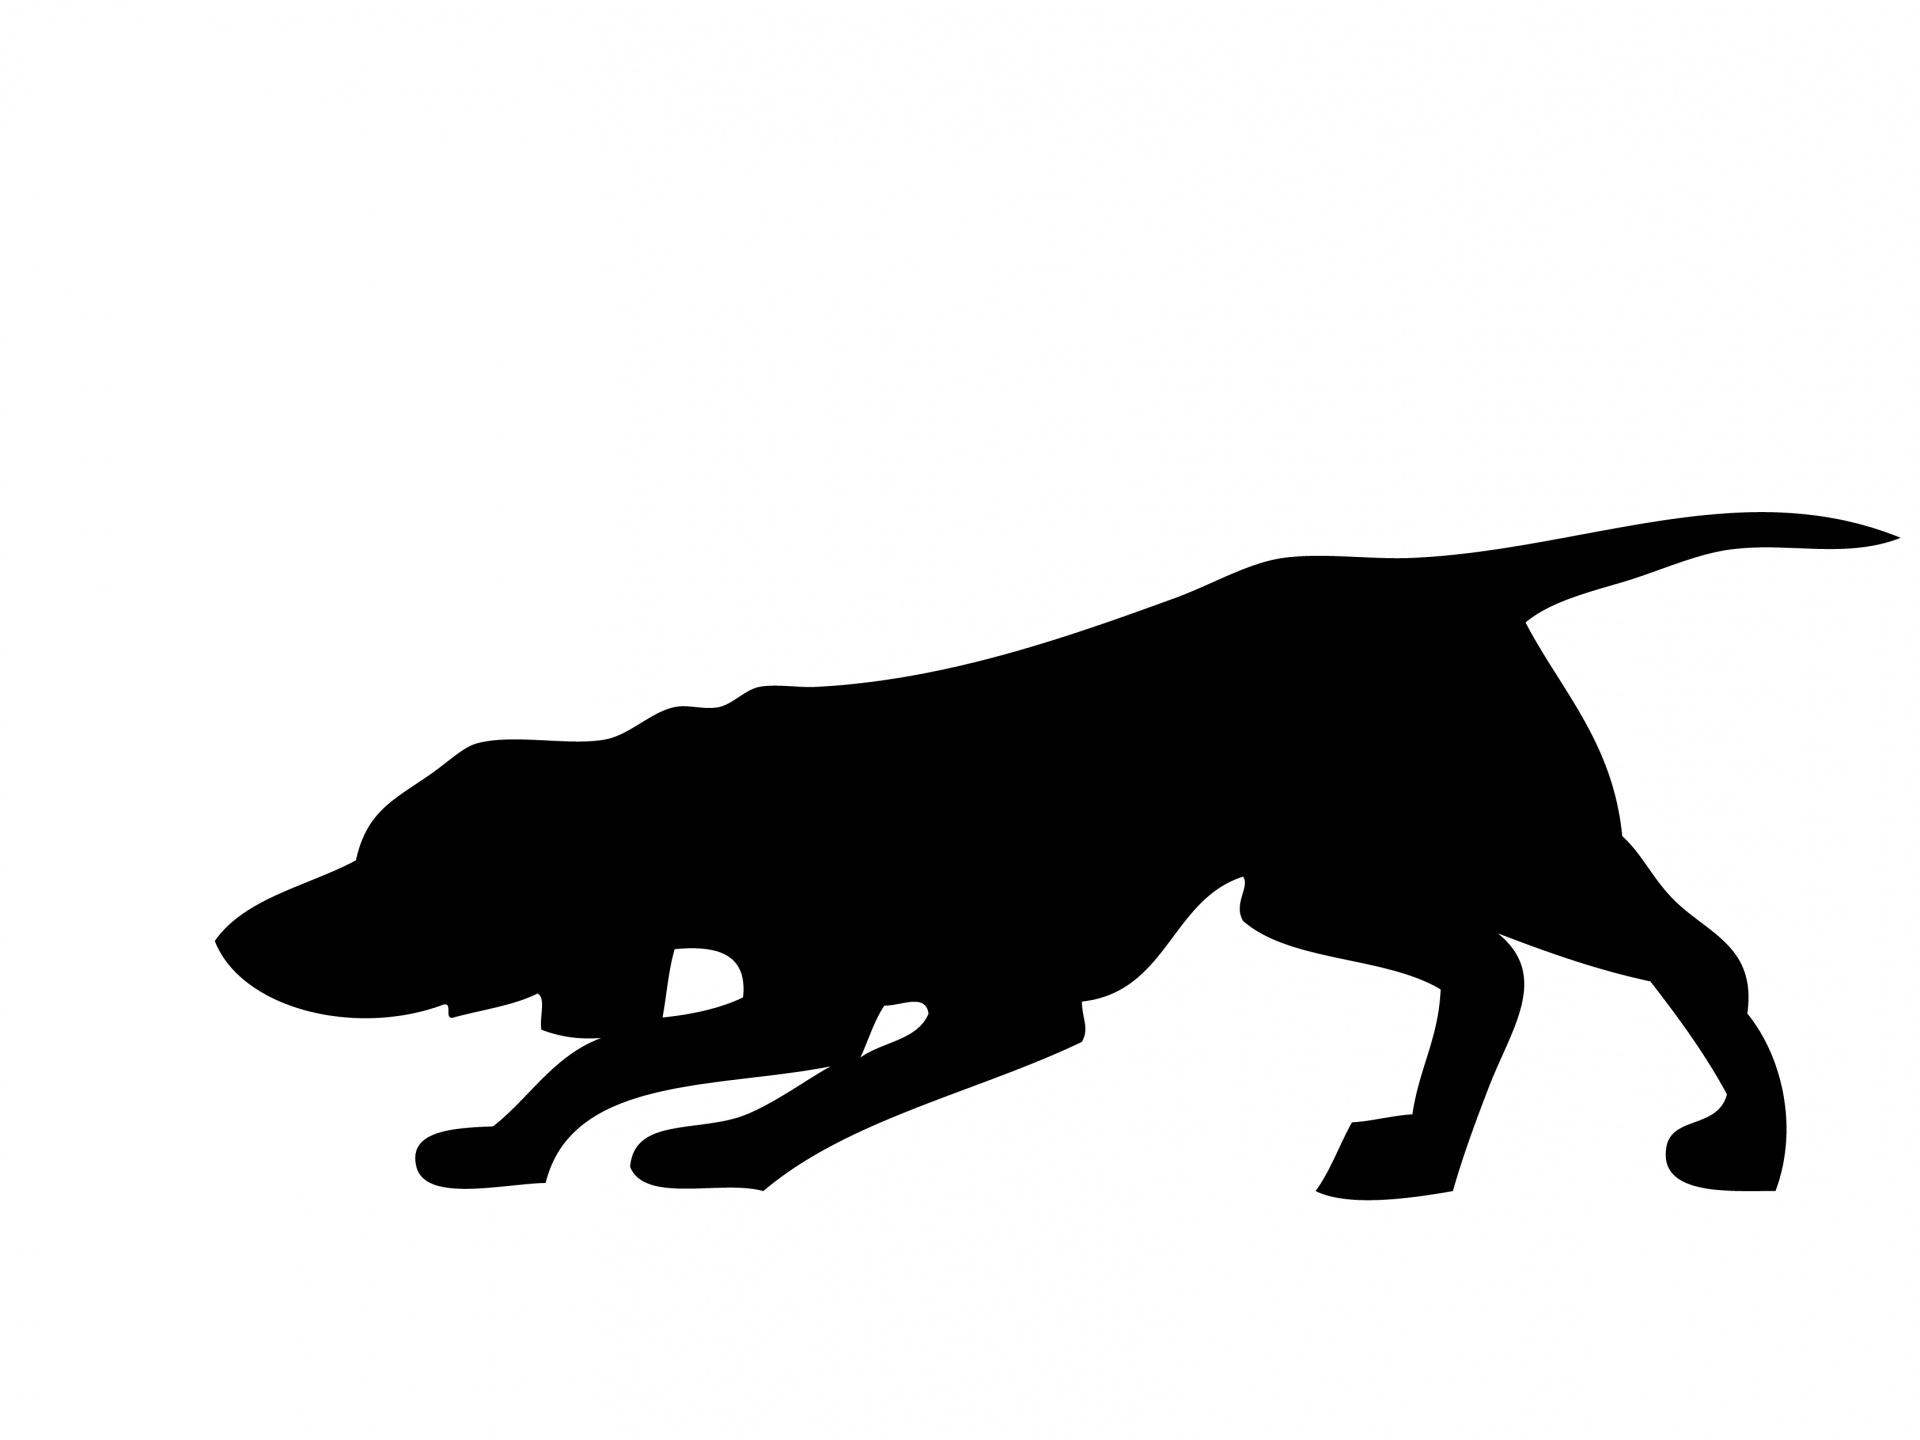 1920x1440 Dog, Hound Black Silhouette Free Stock Photo